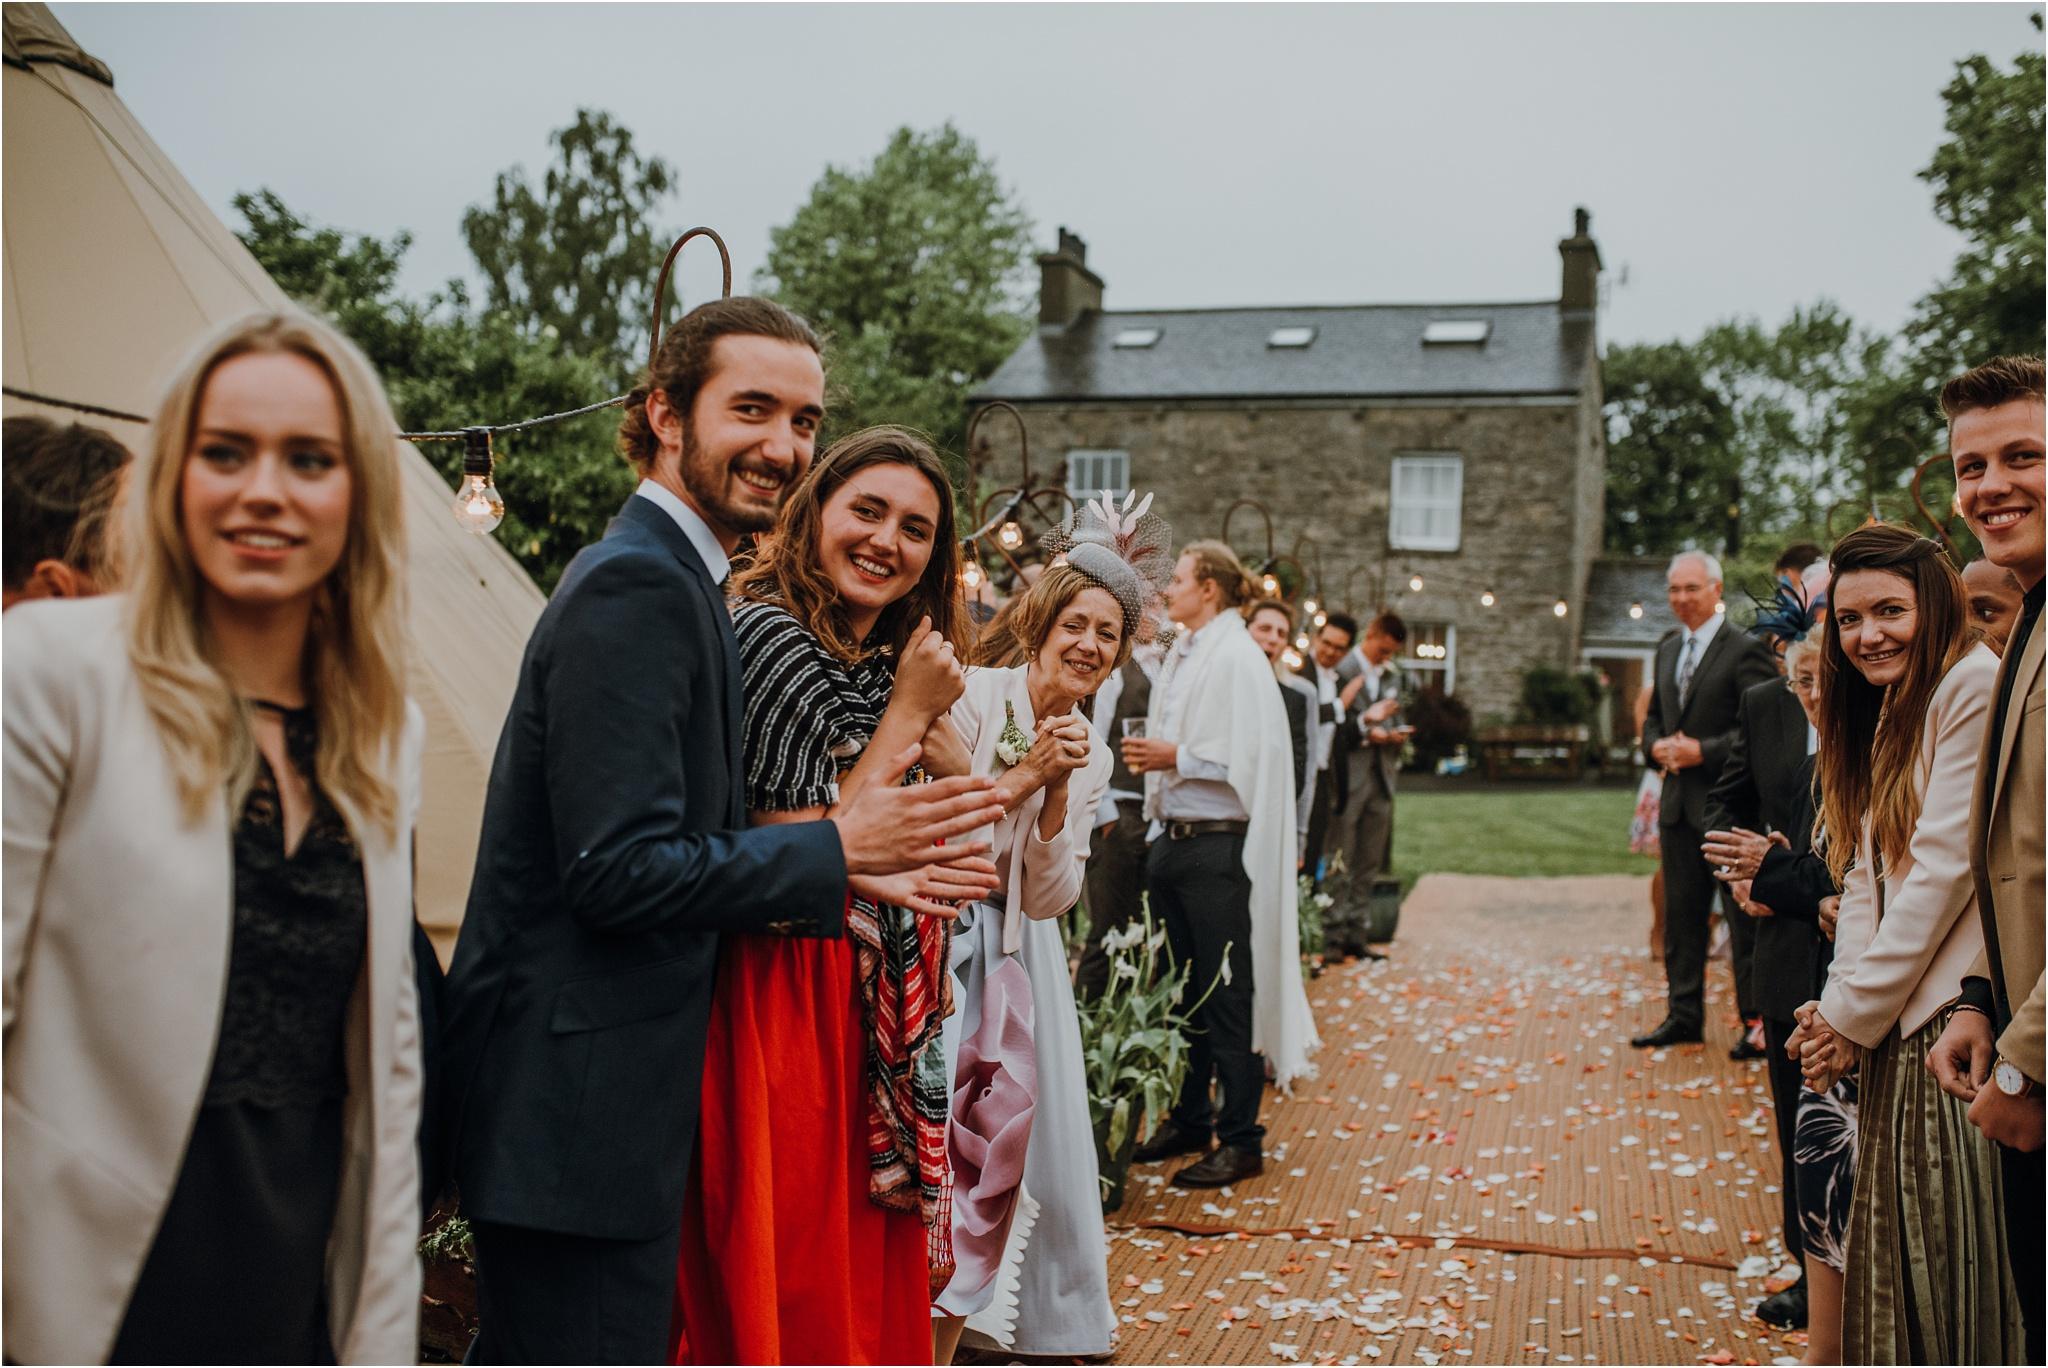 Outdoor-country-wedding-Edinburgh-photographer__0235.jpg